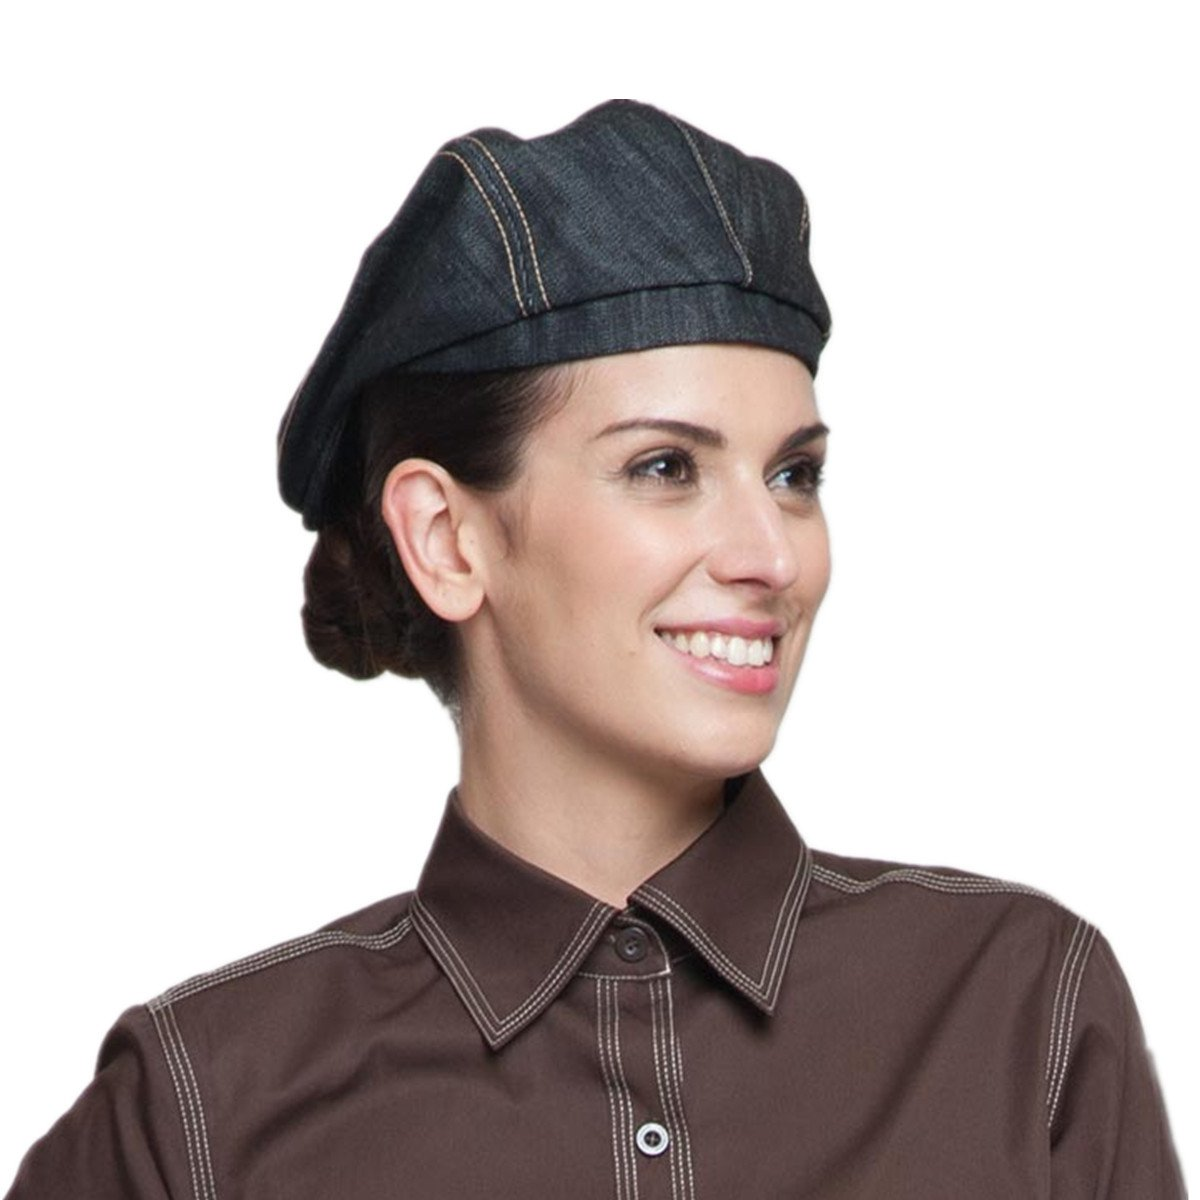 XINFU Chef Hat Cowboy Hotel Hat Waiter Hat Hotel Cafe Working Cap Beret Baseball Cap